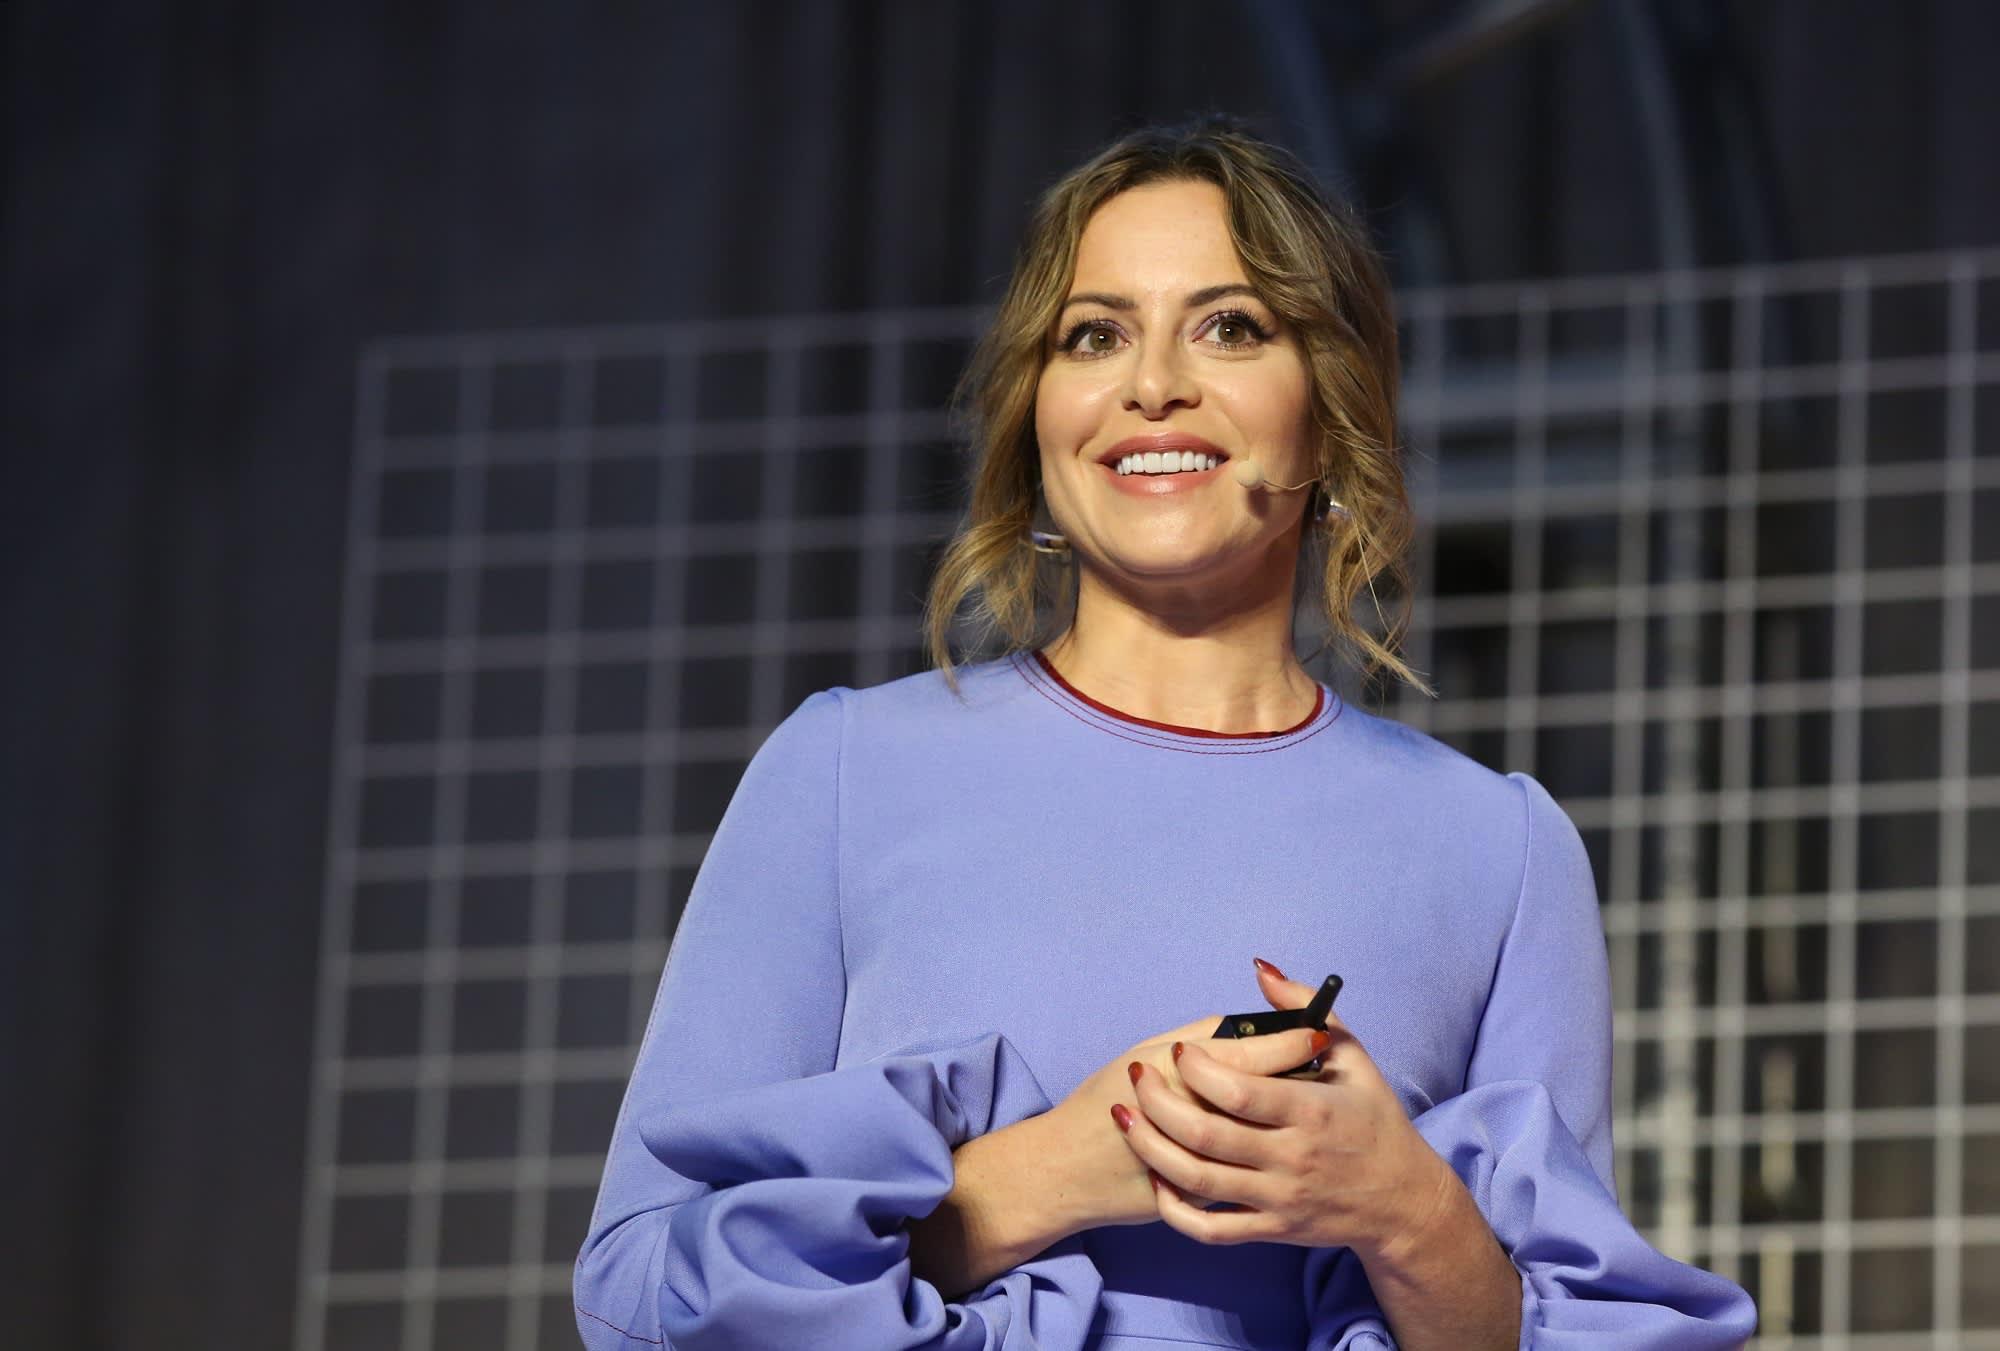 Sophia Amoruso's Girlboss networking platform wants to help professional women find their peers